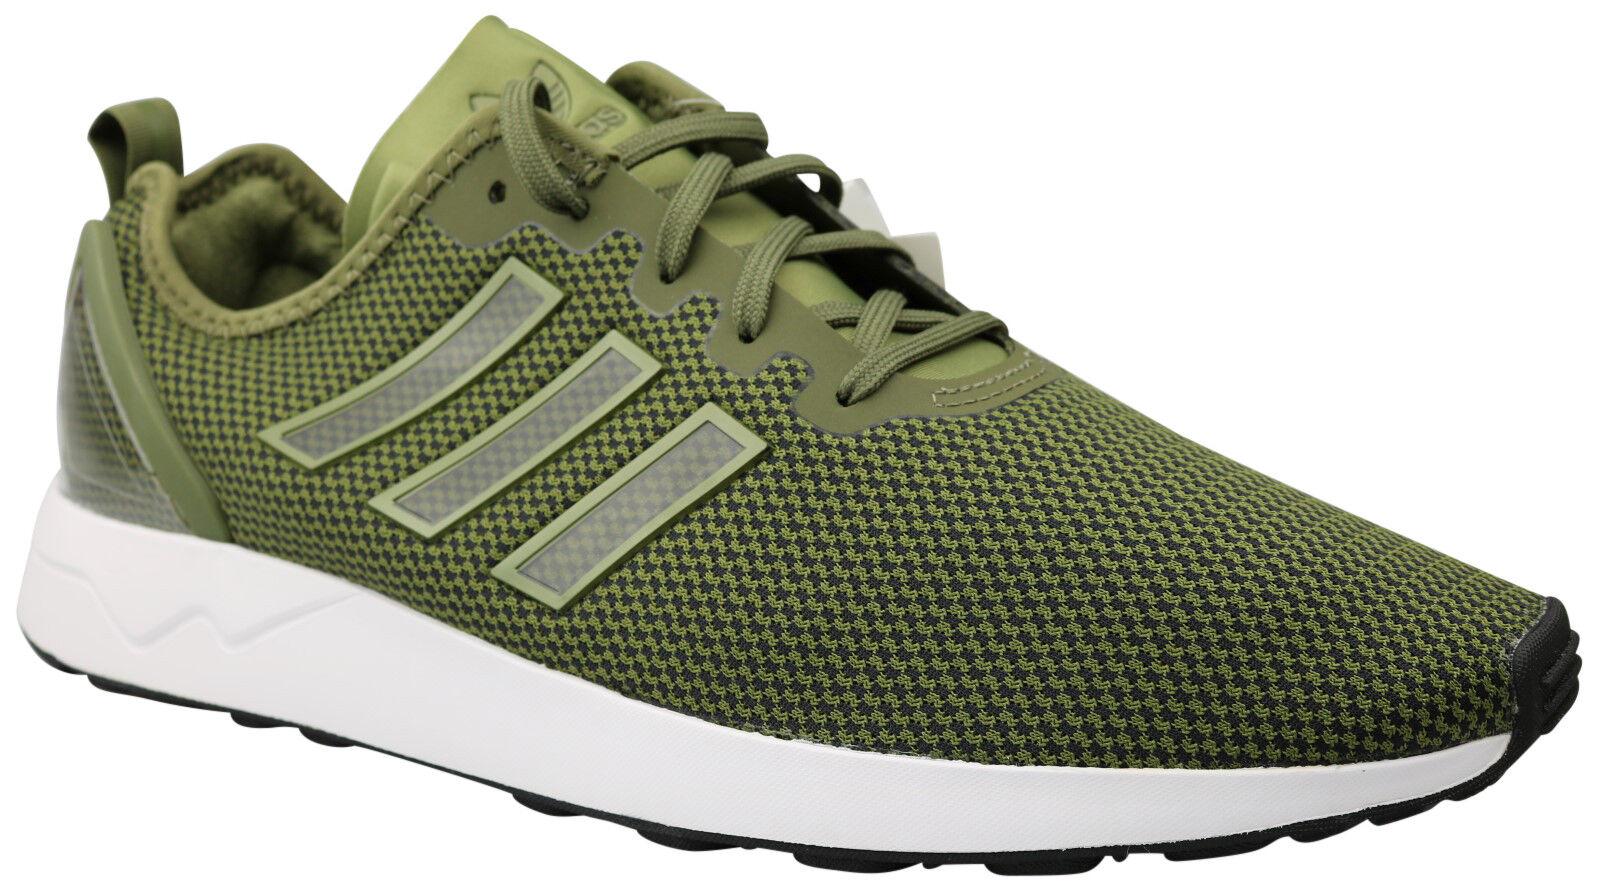 ADIDAS ZX FLUX ADV Uomo Sneaker Scarpe Olive aq2680 tg. 46,5 & 47 NUOVO & OVP | Facile da usare  | Sig/Sig Ra Scarpa